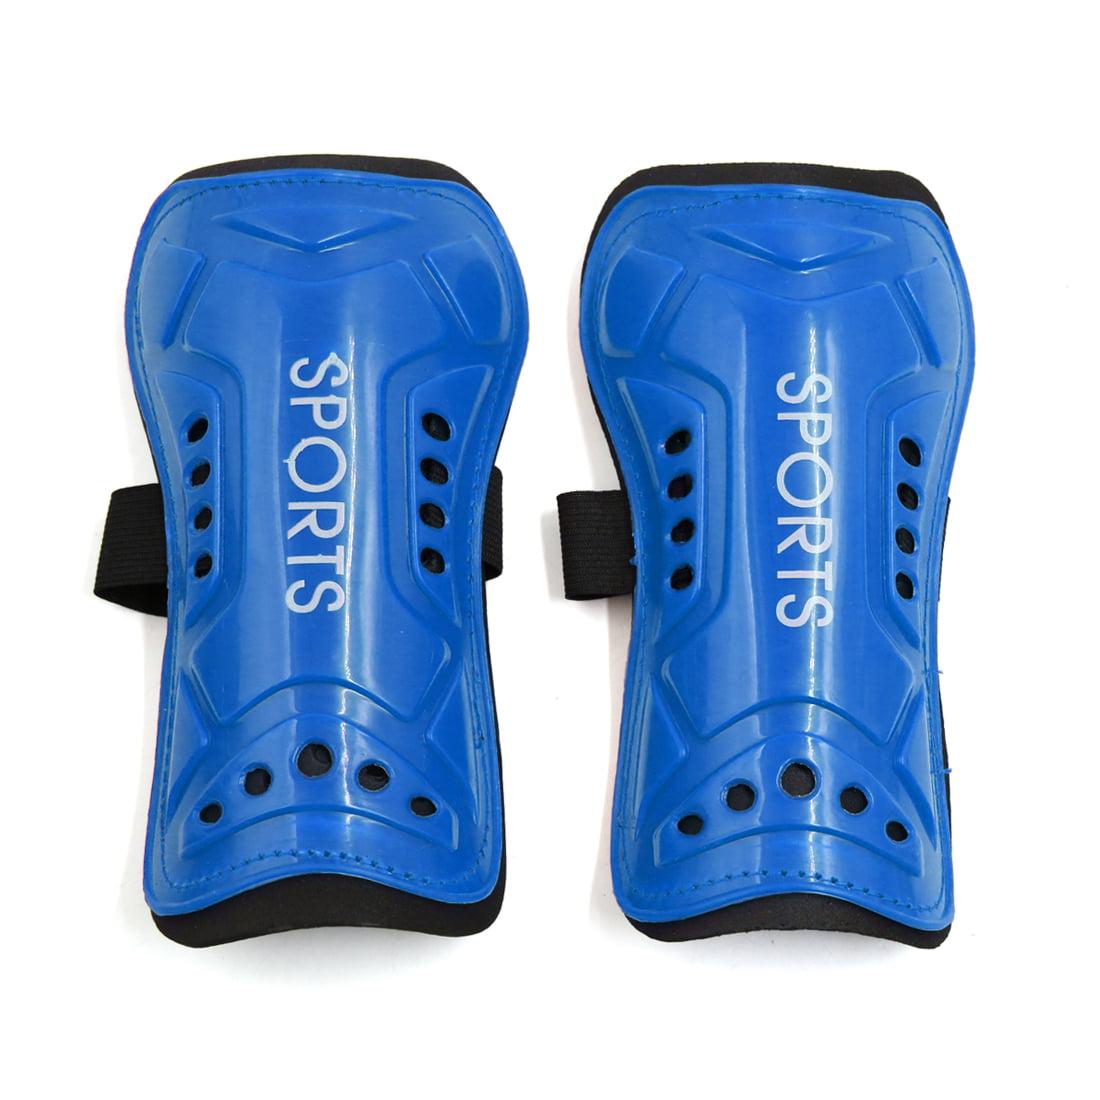 6aa5b80ef 2 Pcs Kids Football Shin Pads Soccer Guards Leg Protector Protective ...